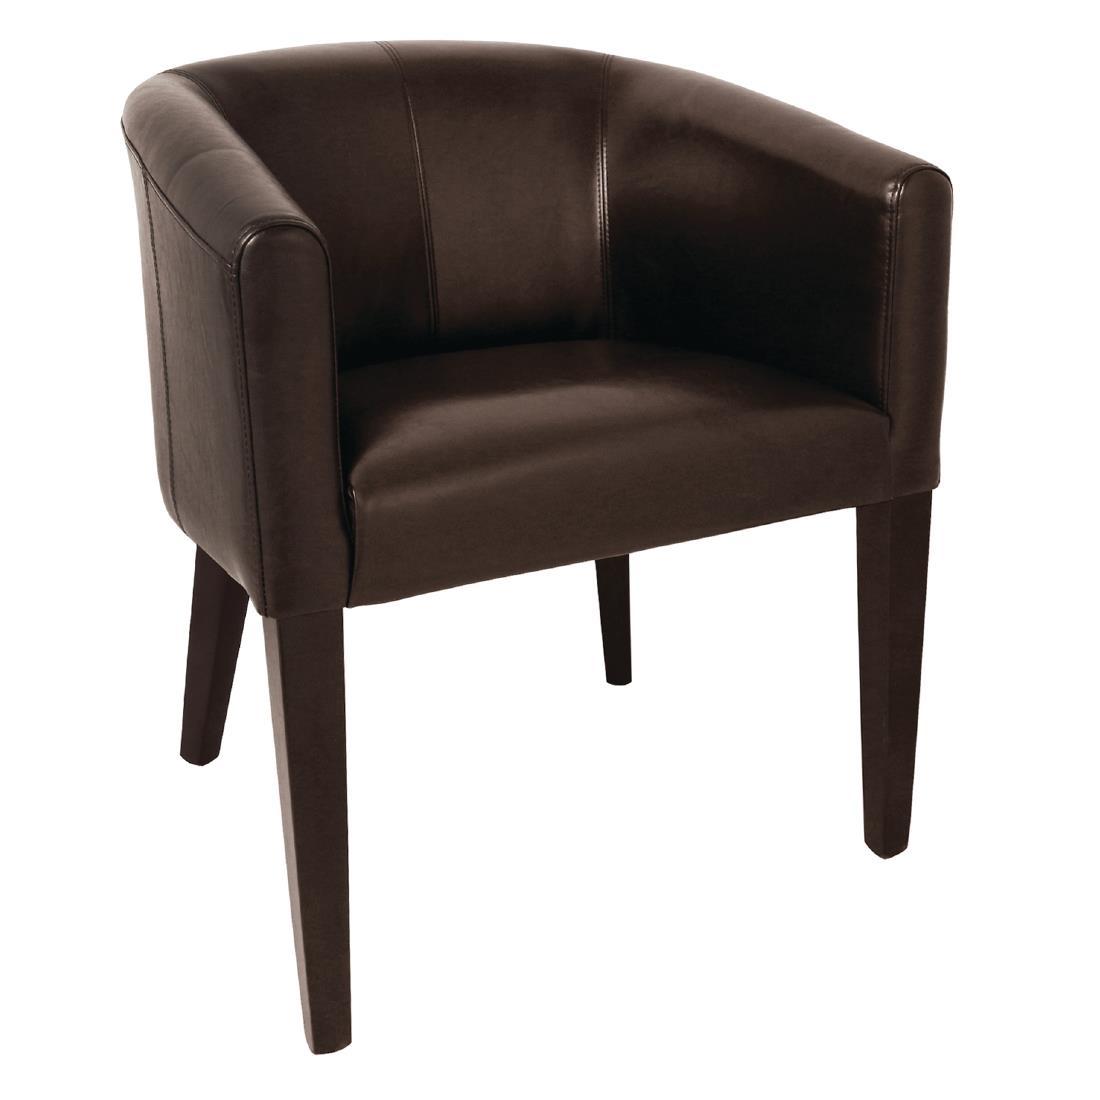 Faux Leather Tub Armchair - Dark Brown